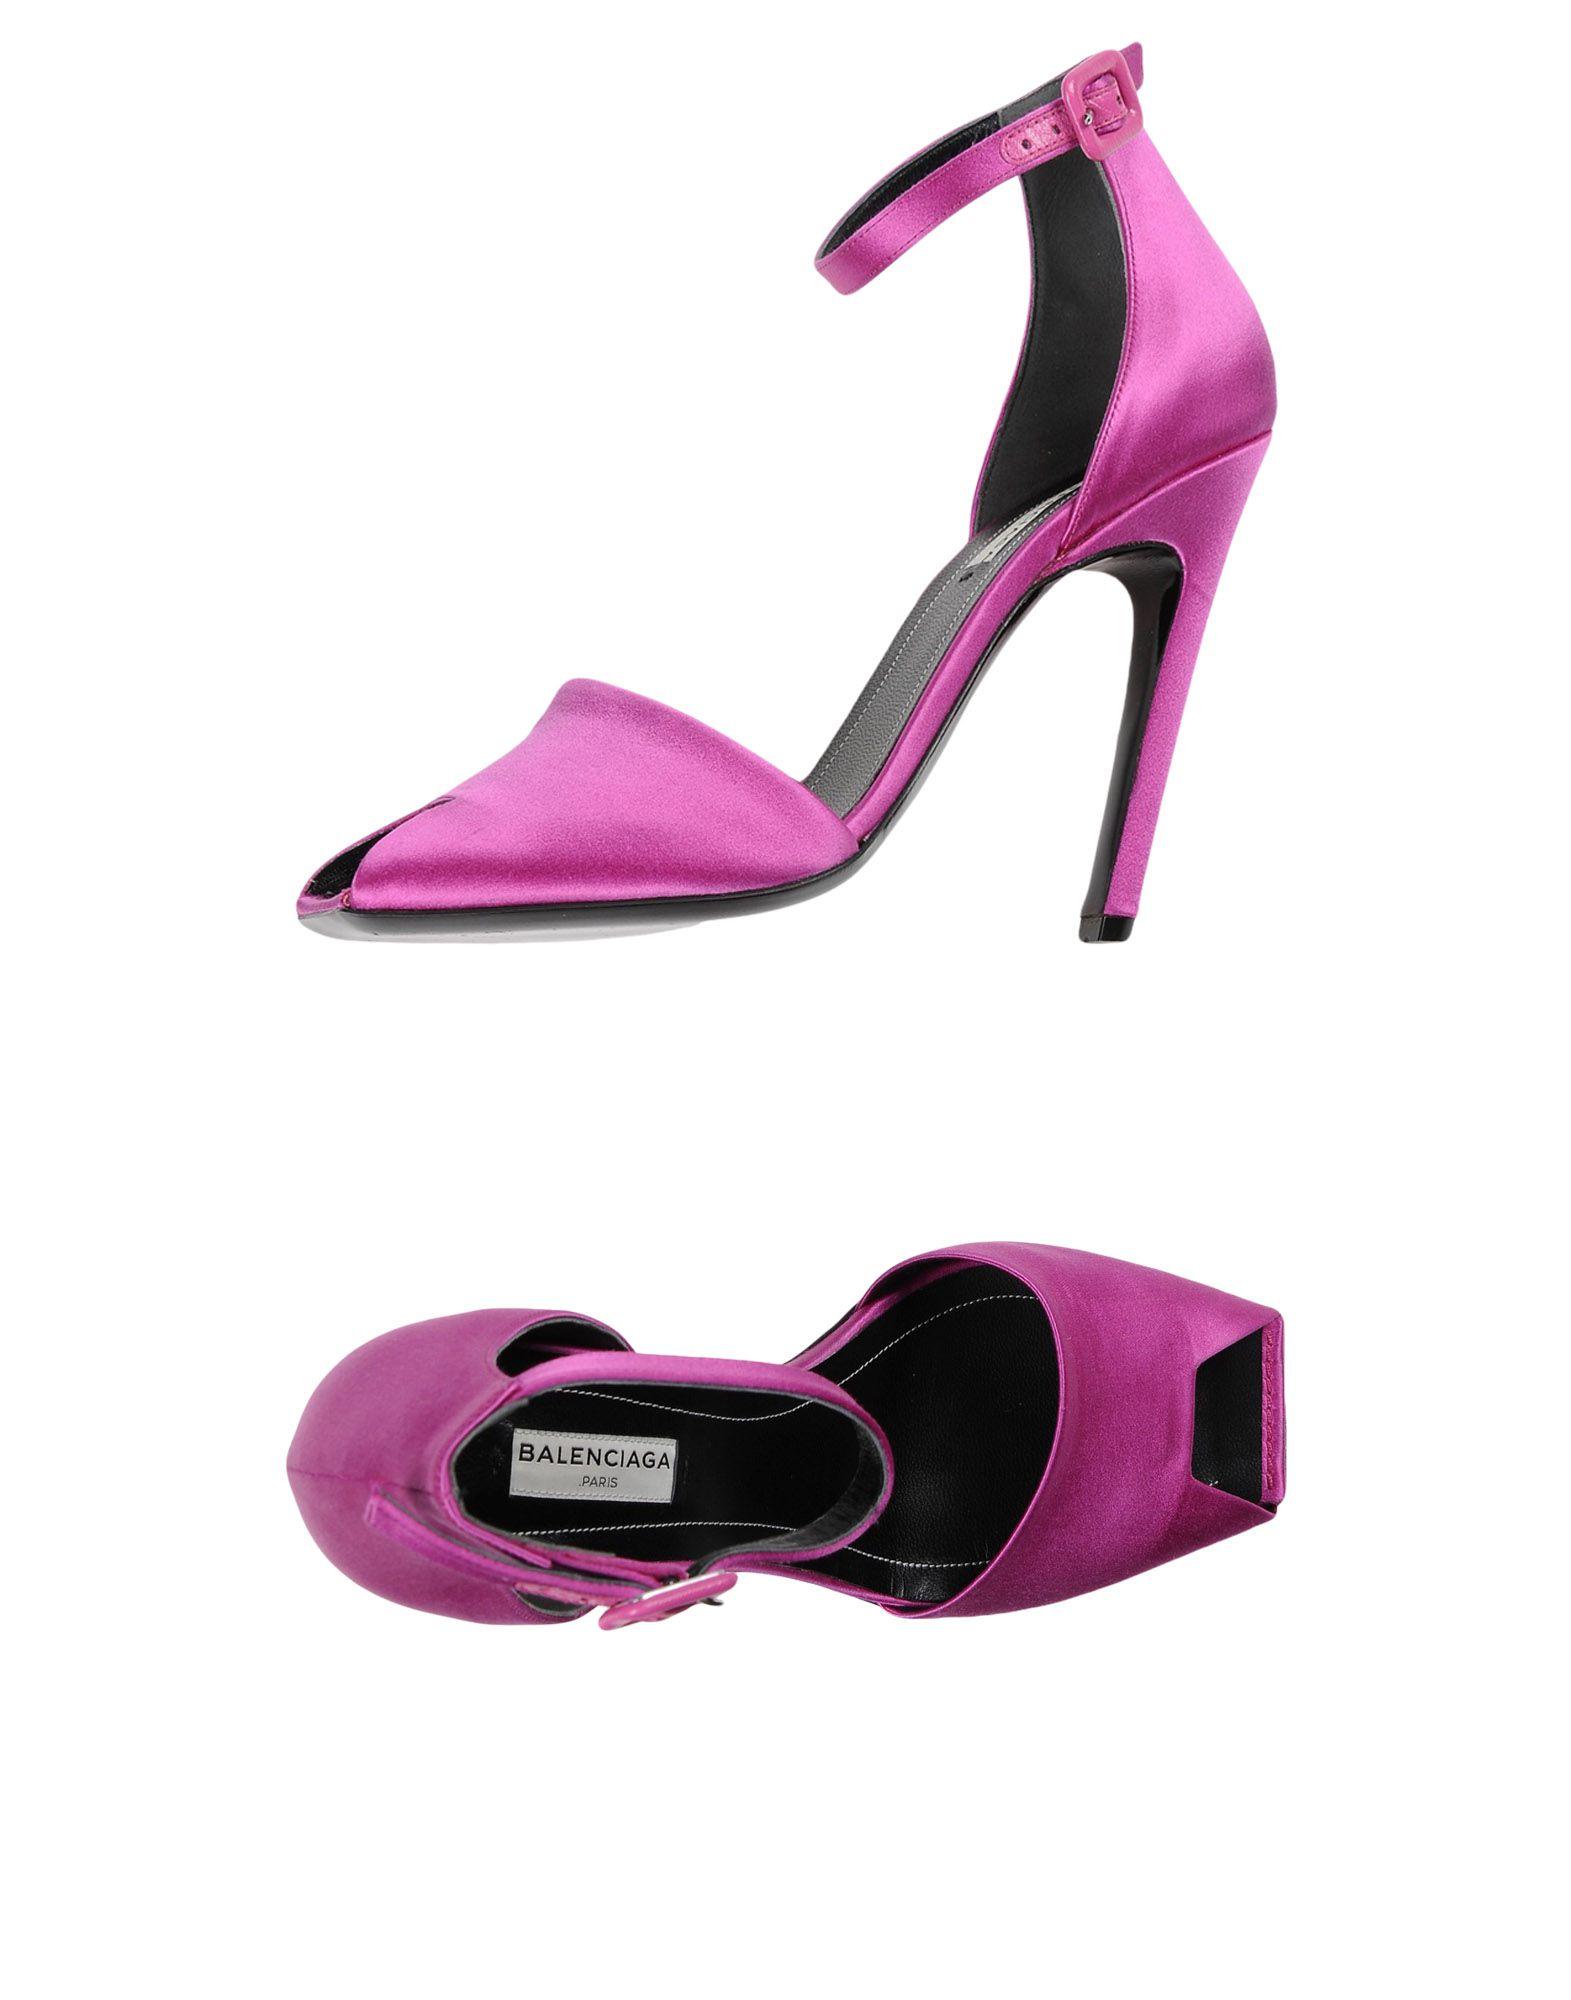 Balenciaga Sandalen Damen  11330328PEGut aussehende strapazierfähige Schuhe